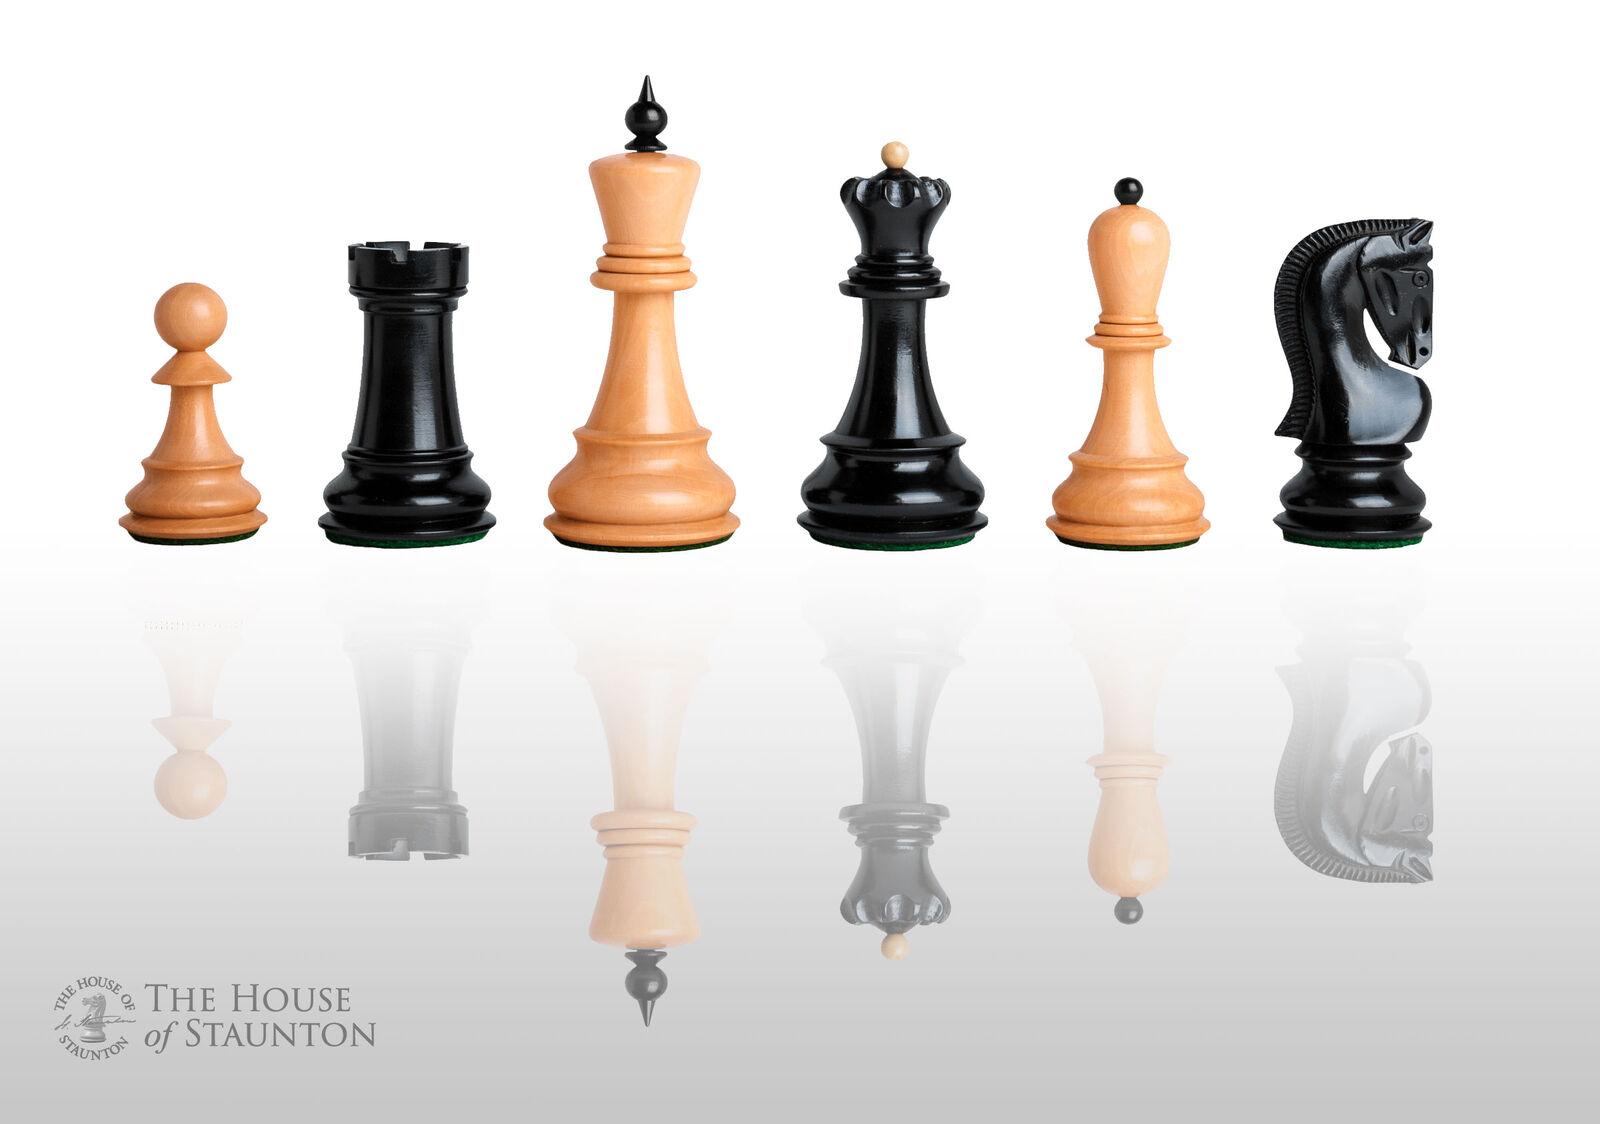 USCF Sales The Zagreb '59 Chess Set - Pieces Only - 3.875  King - Ebonized Boxwo